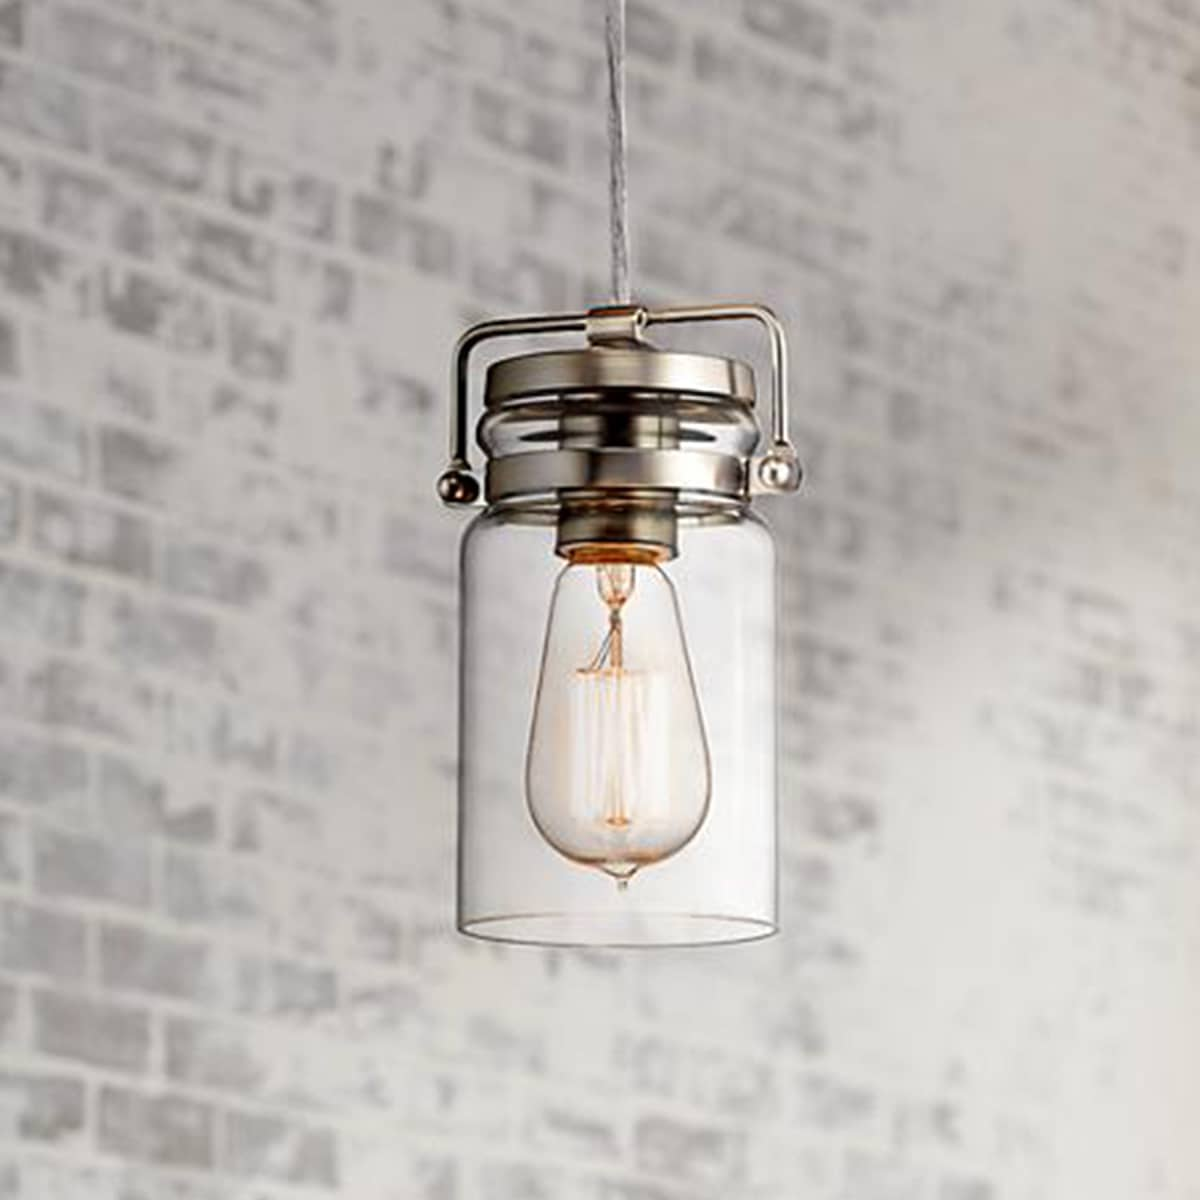 10 Budget-Friendly Kitchen Pendant Lights: gallery image 5